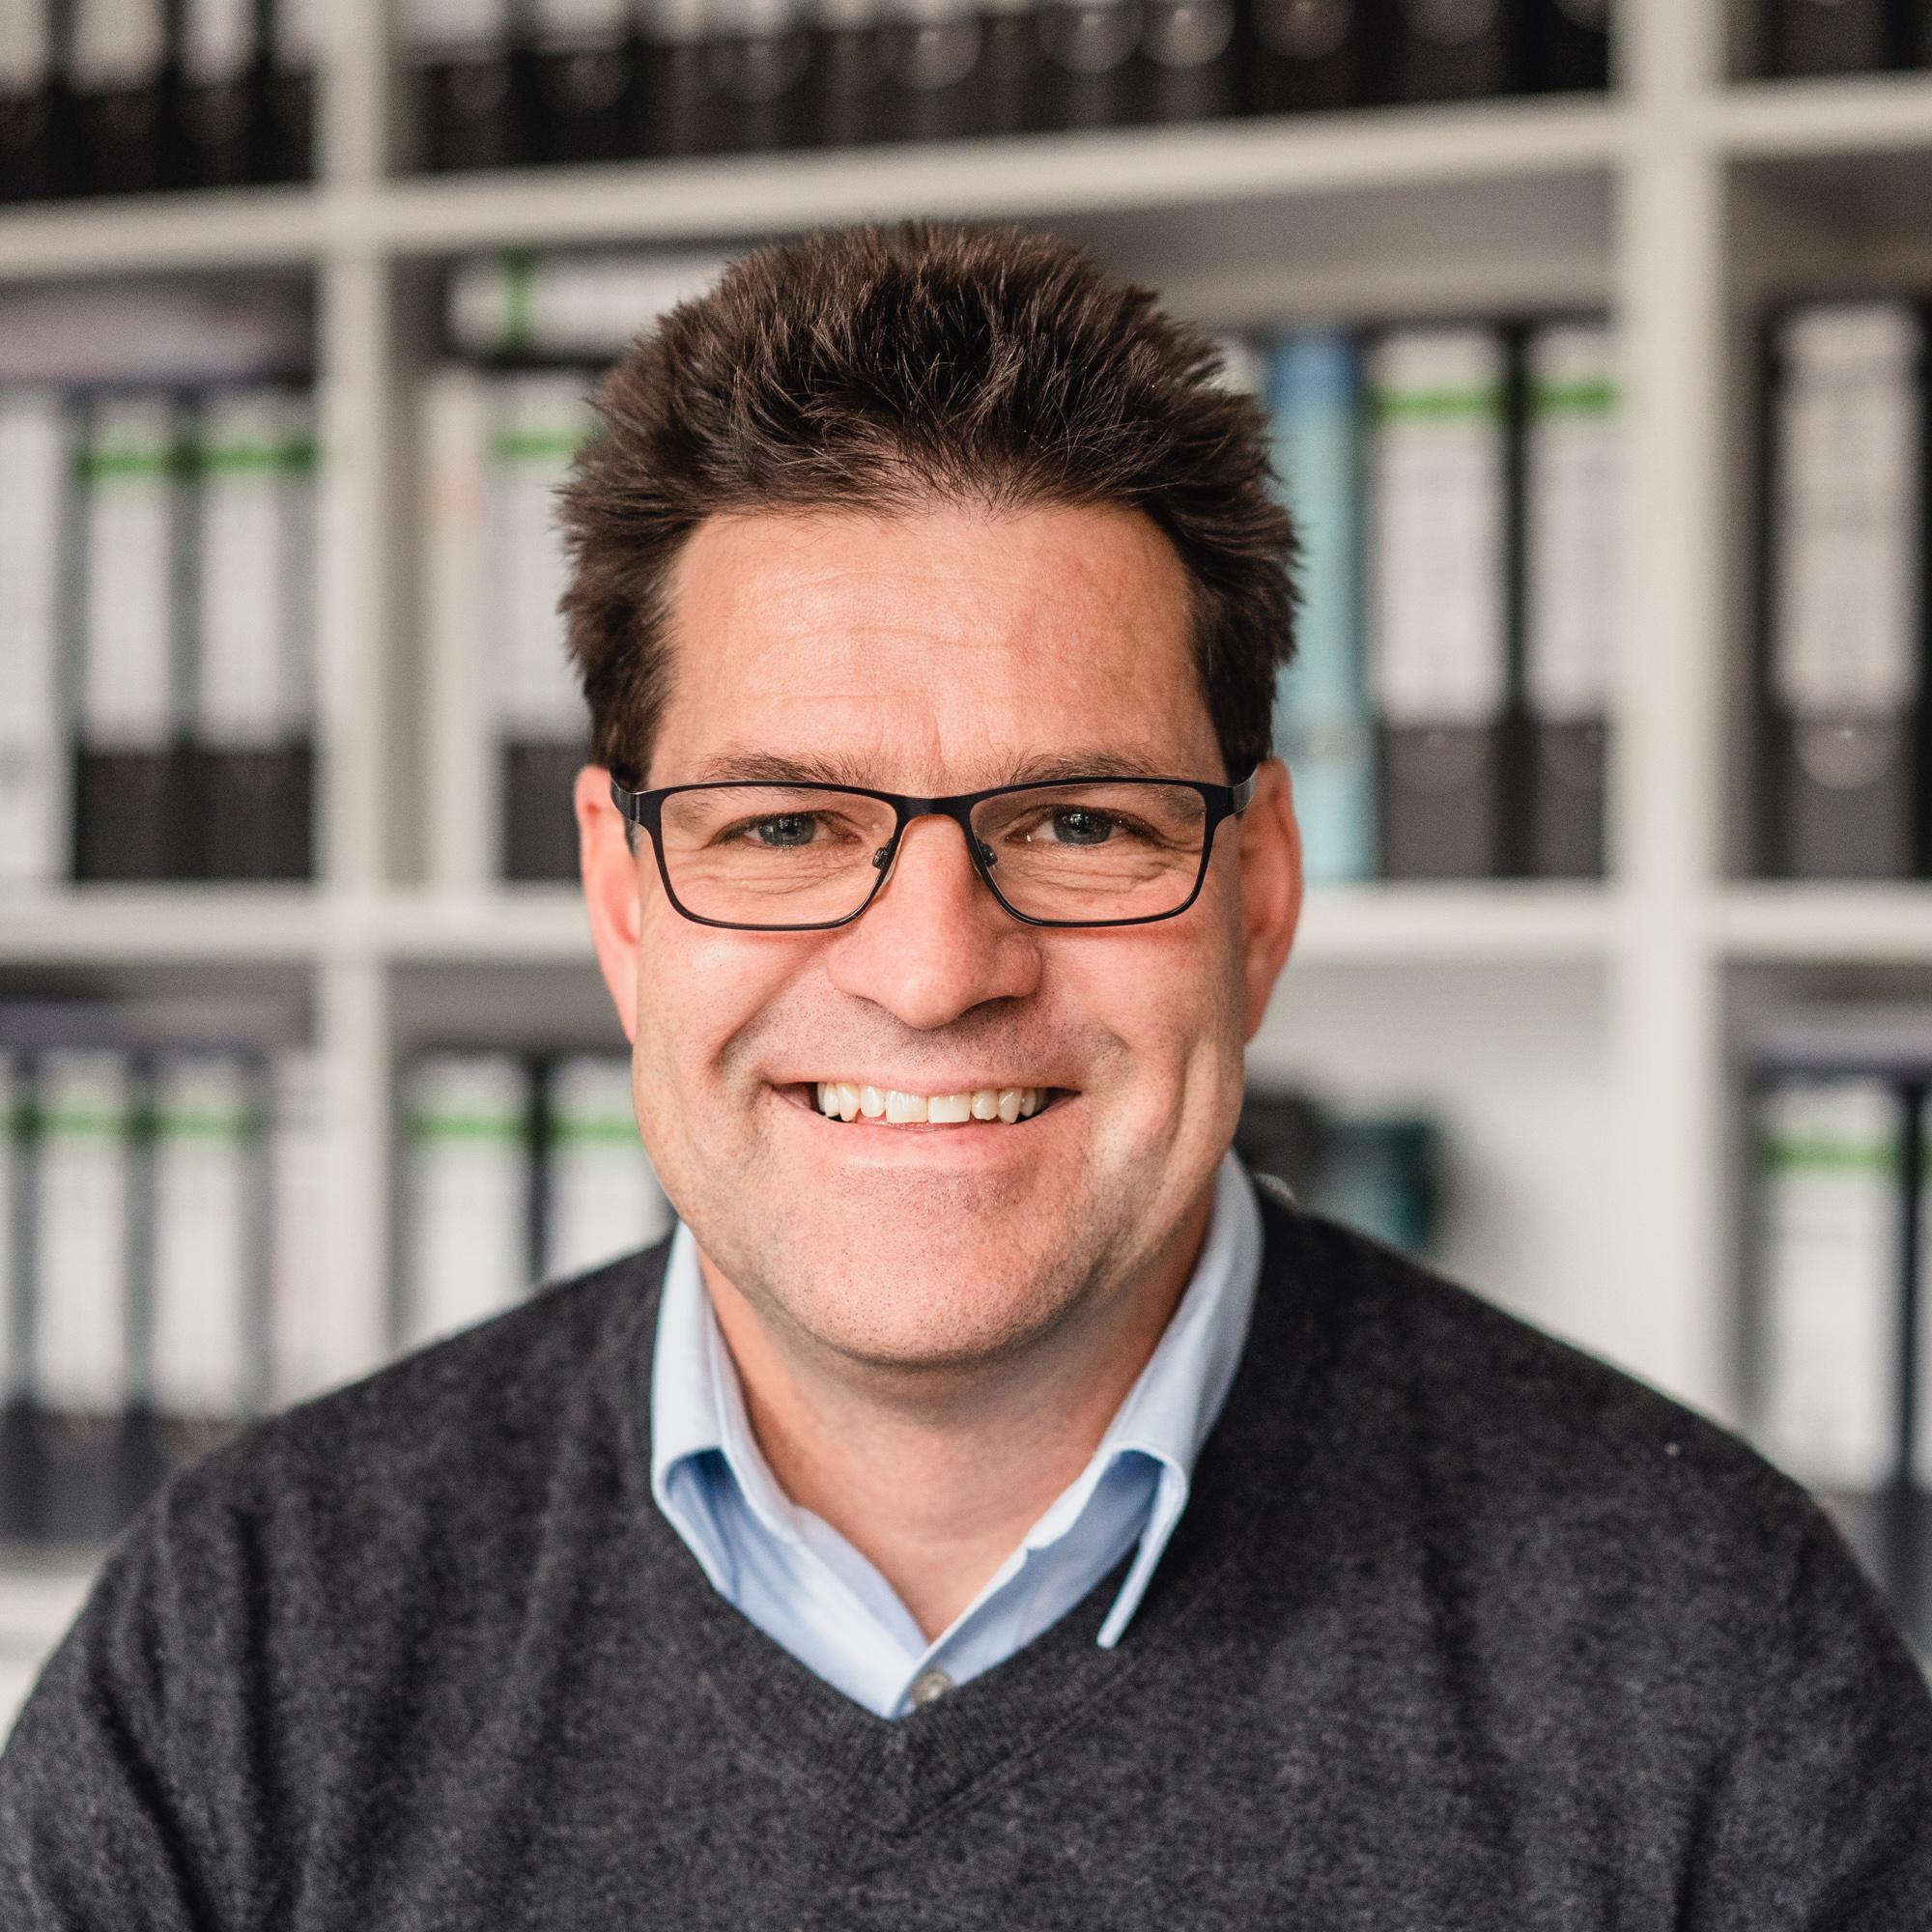 Profilbild Thomas Gassner